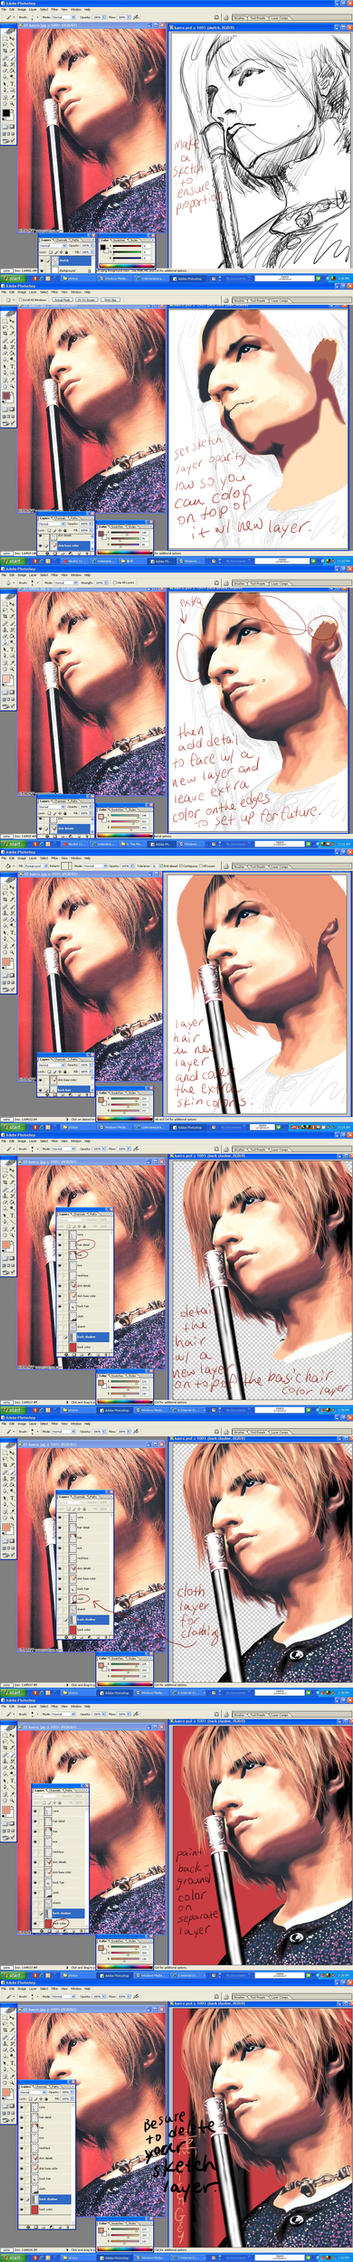 Photoshop realism tutorial by CodenameParanormal